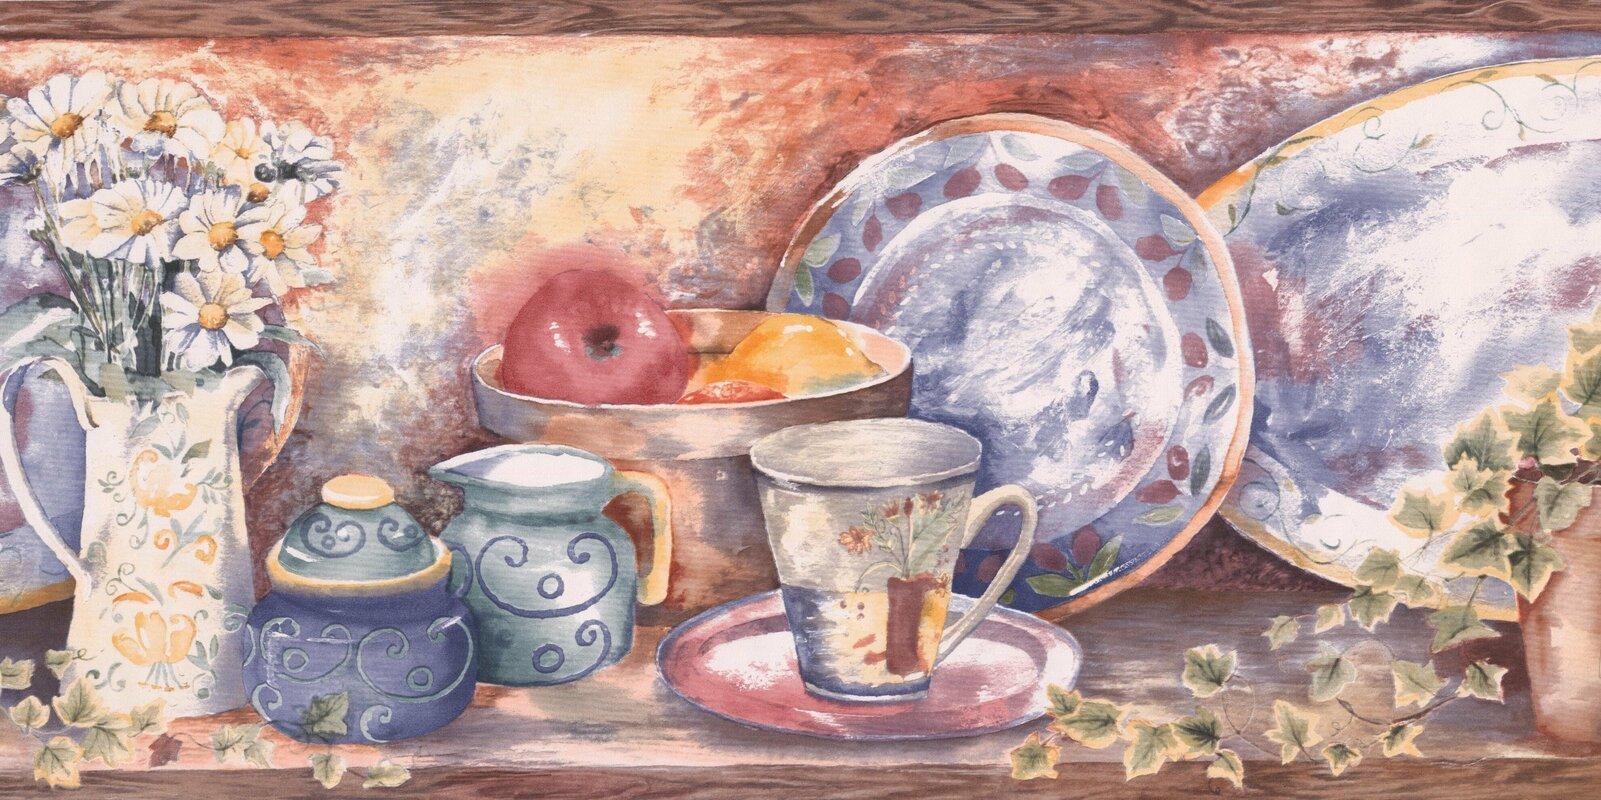 August grove bourassa paint by design vintage kitchen shelf cup bourassa paint by design vintage kitchen shelf cup jug vase plate fruit bowl 10 l reviewsmspy